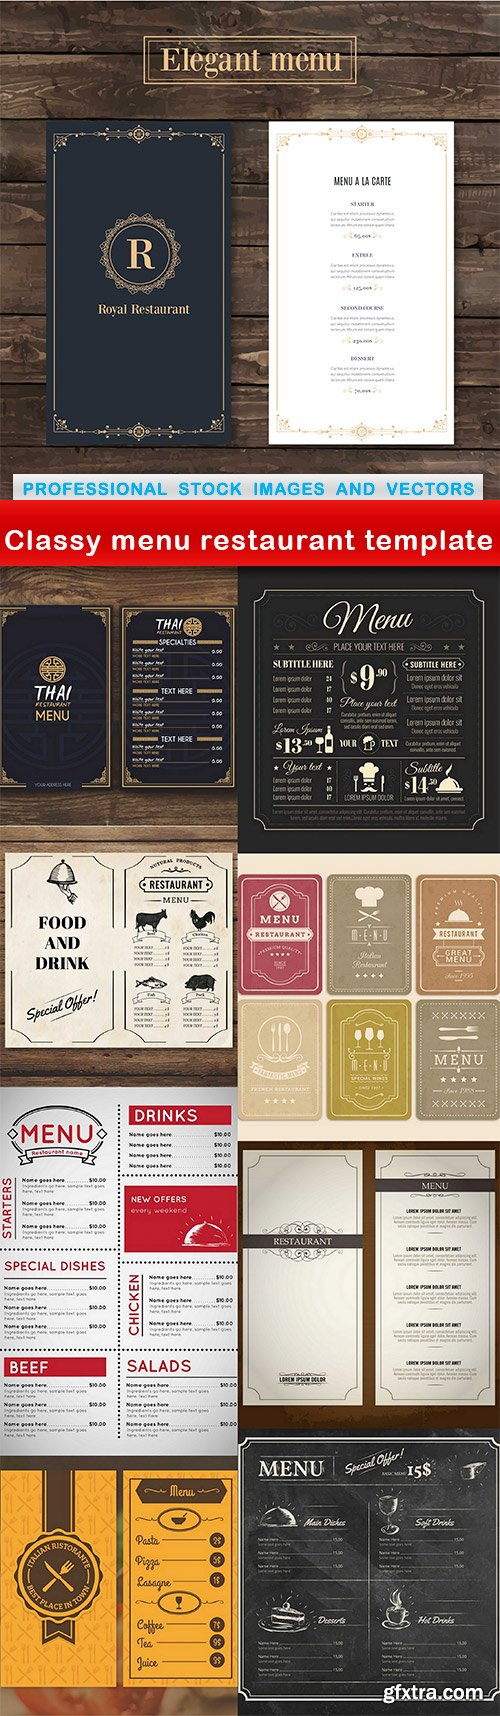 Classy menu restaurant template - 9 EPS